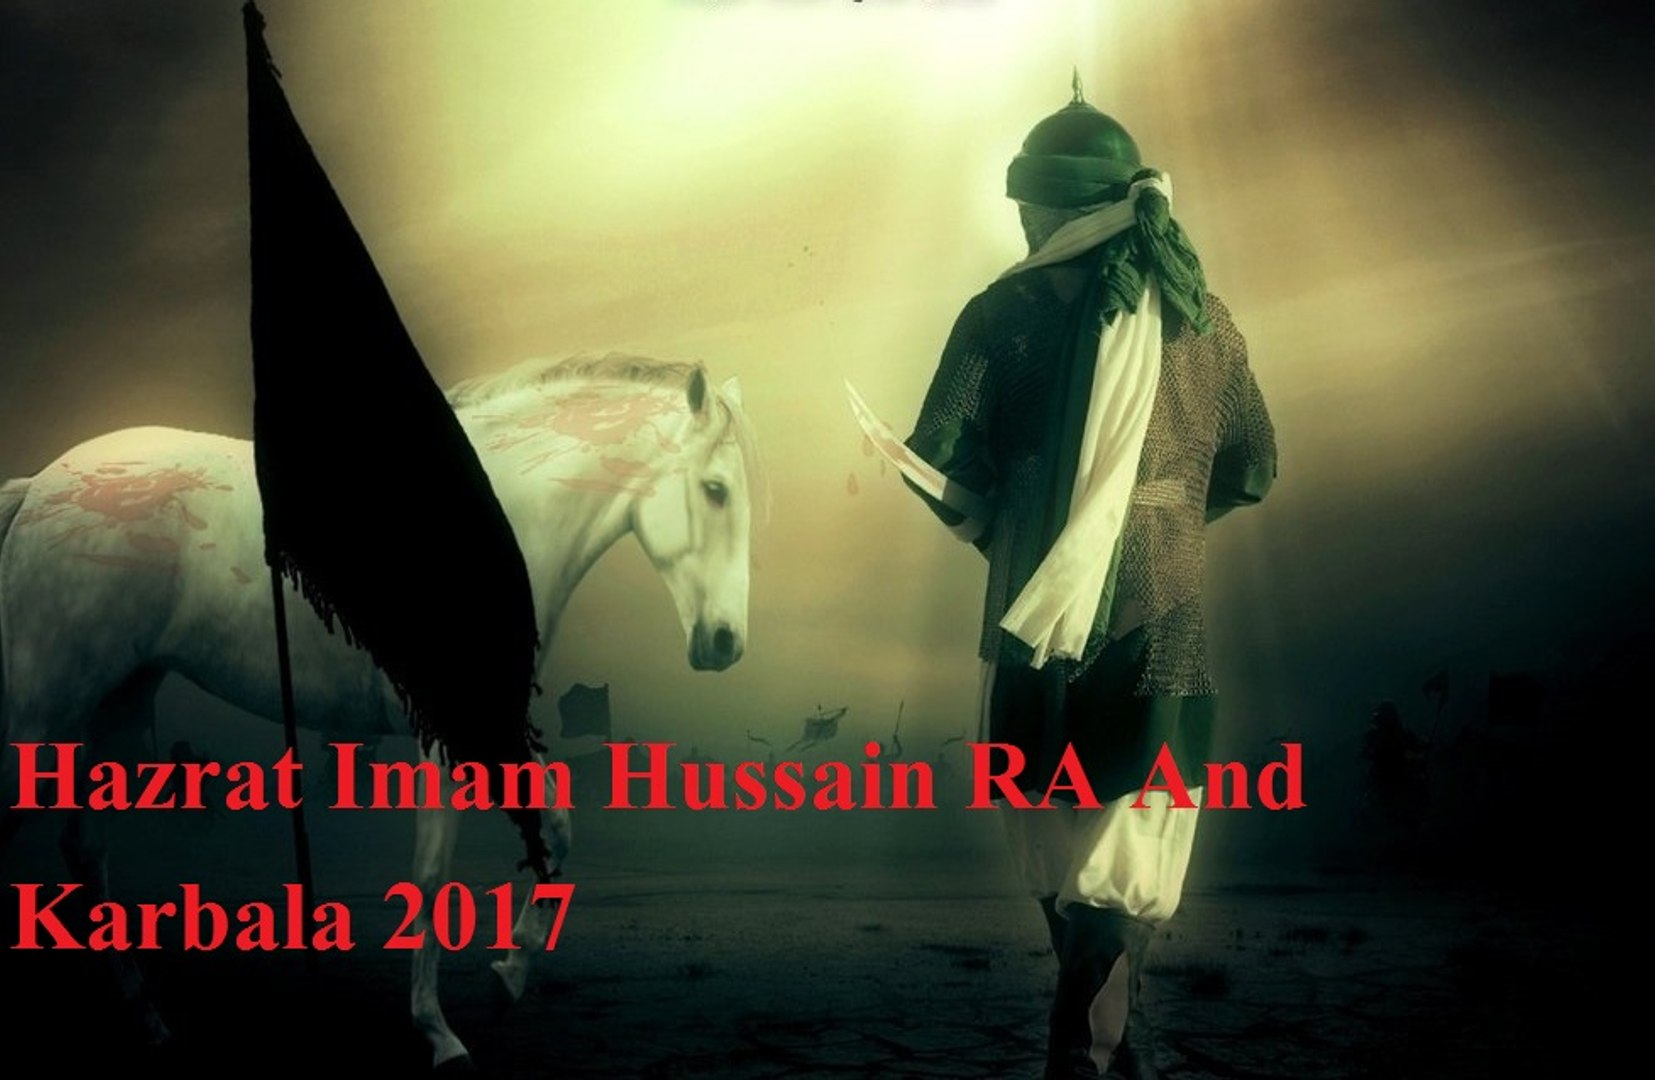 Hazrat Imam Hussain RA & Karbala 2017